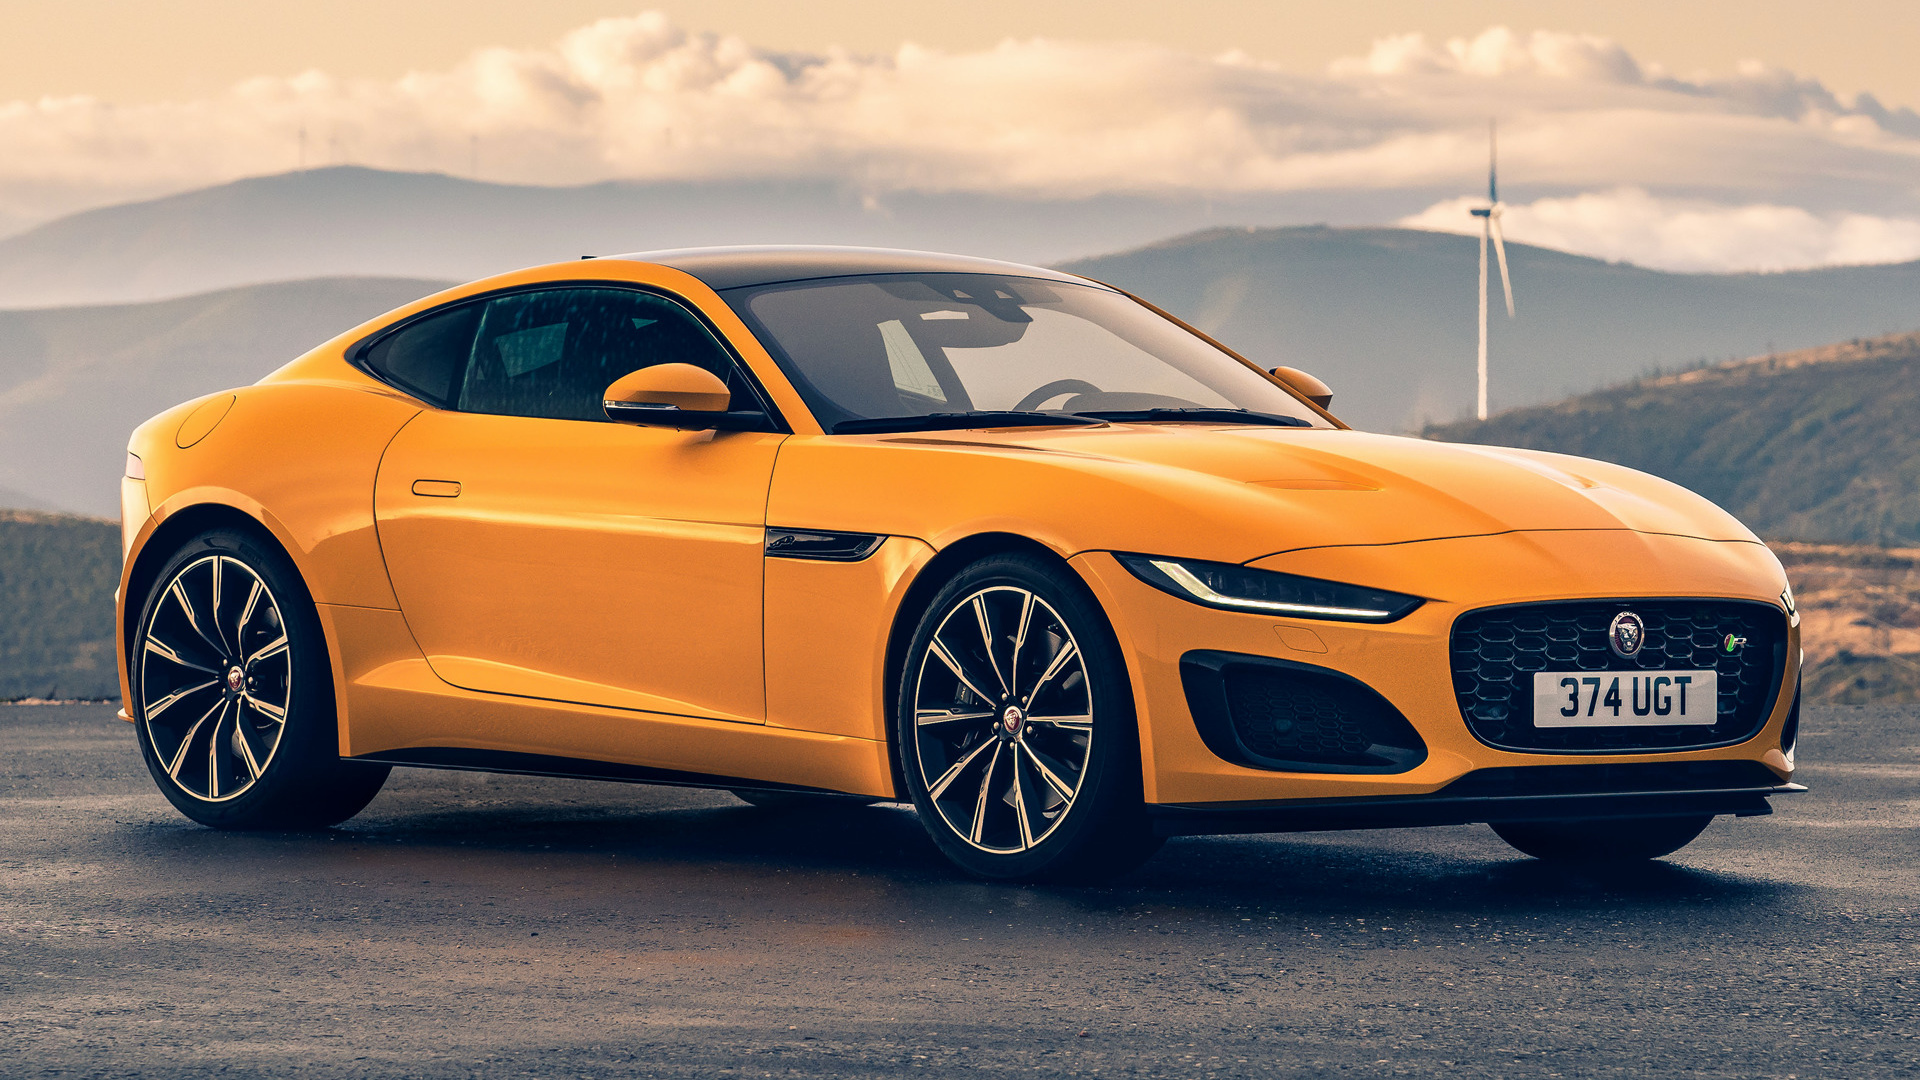 2020 jaguar f-type r coupe hd wallpaper   background image